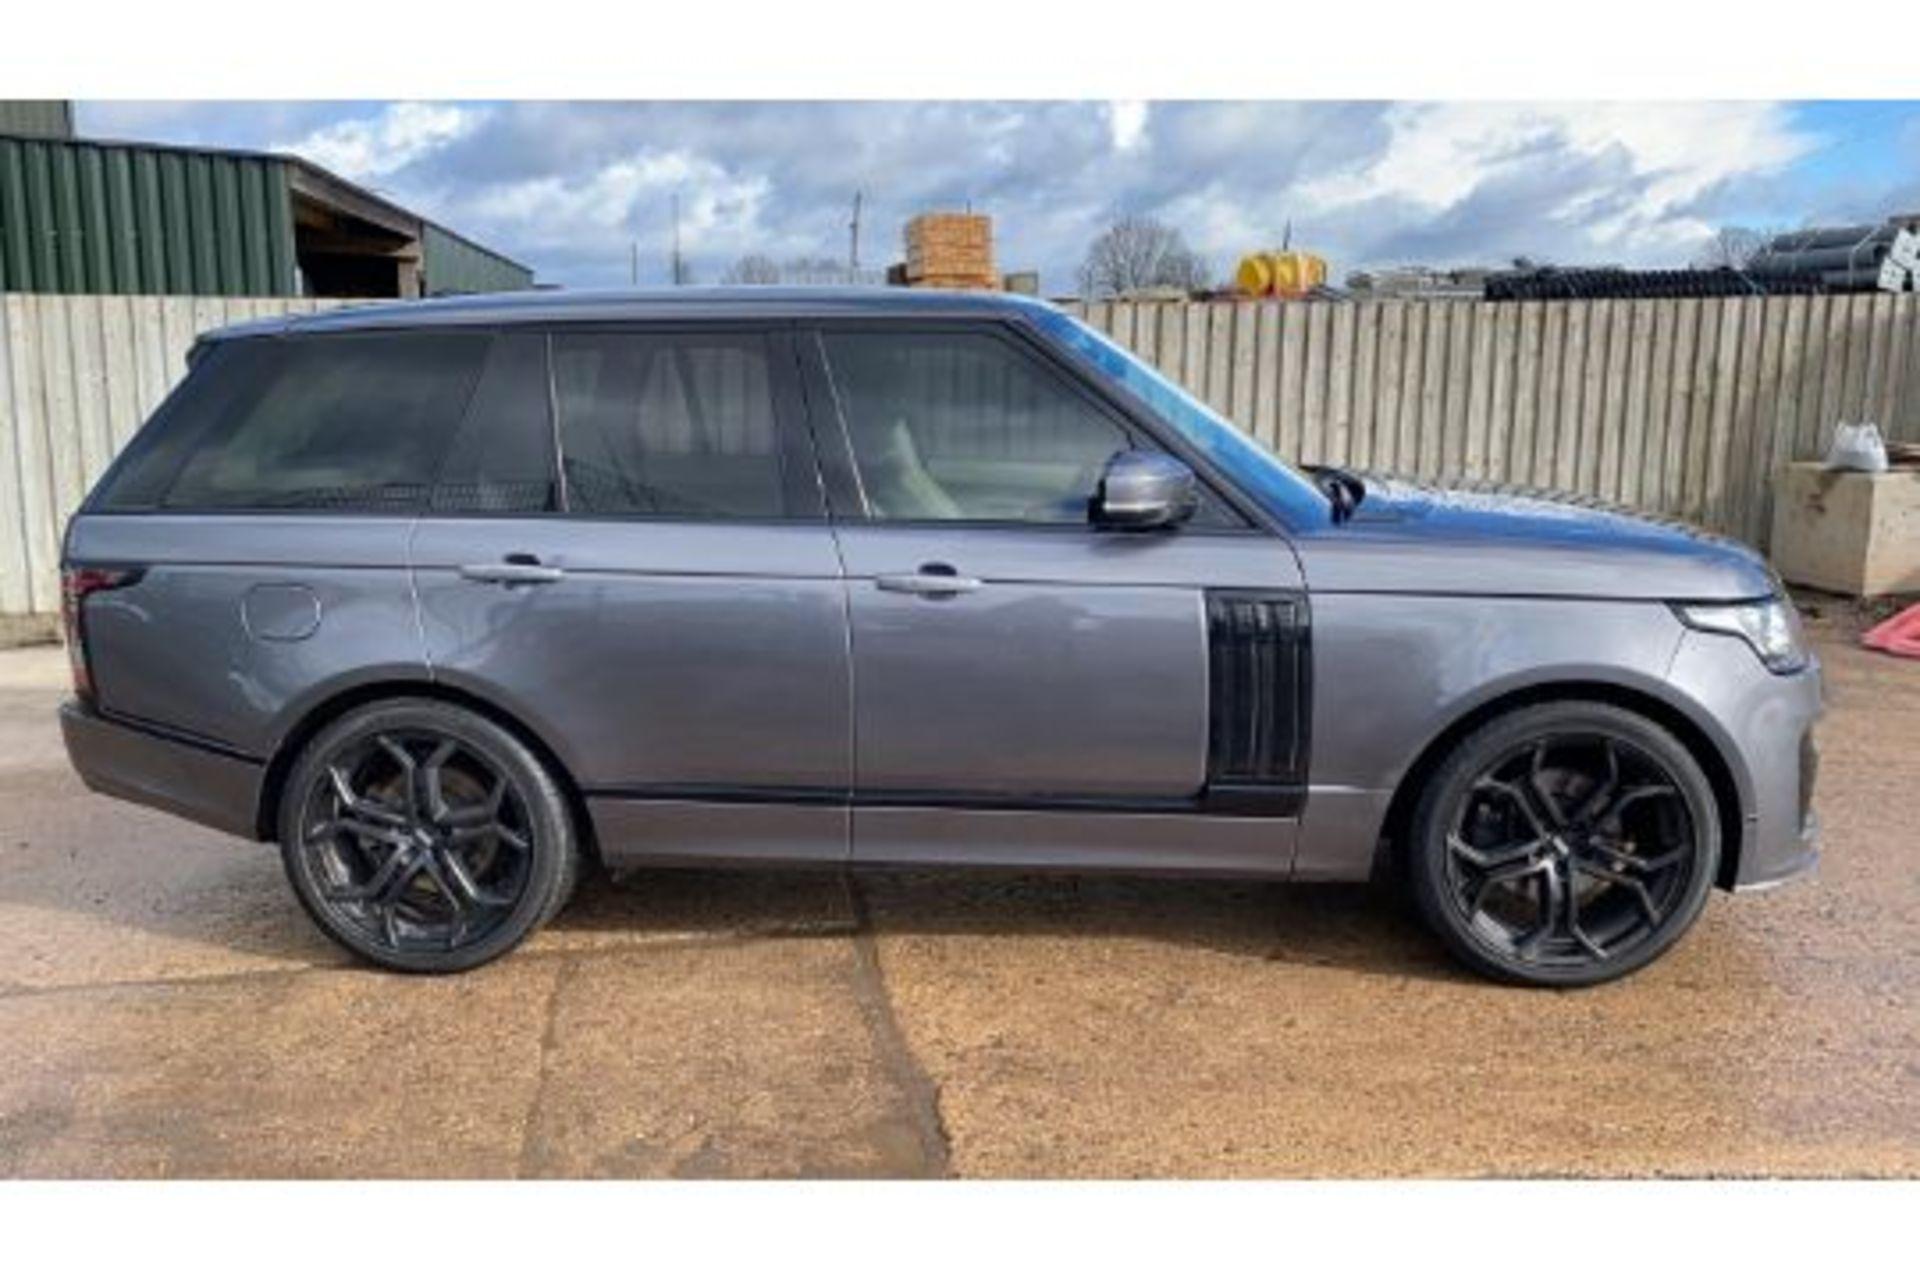 Range Rover Vogue 3.0 TDV6 SE Auto - Black Pack - NEW SHAPE - FULLY LOADED - Pan Roof - Image 6 of 30